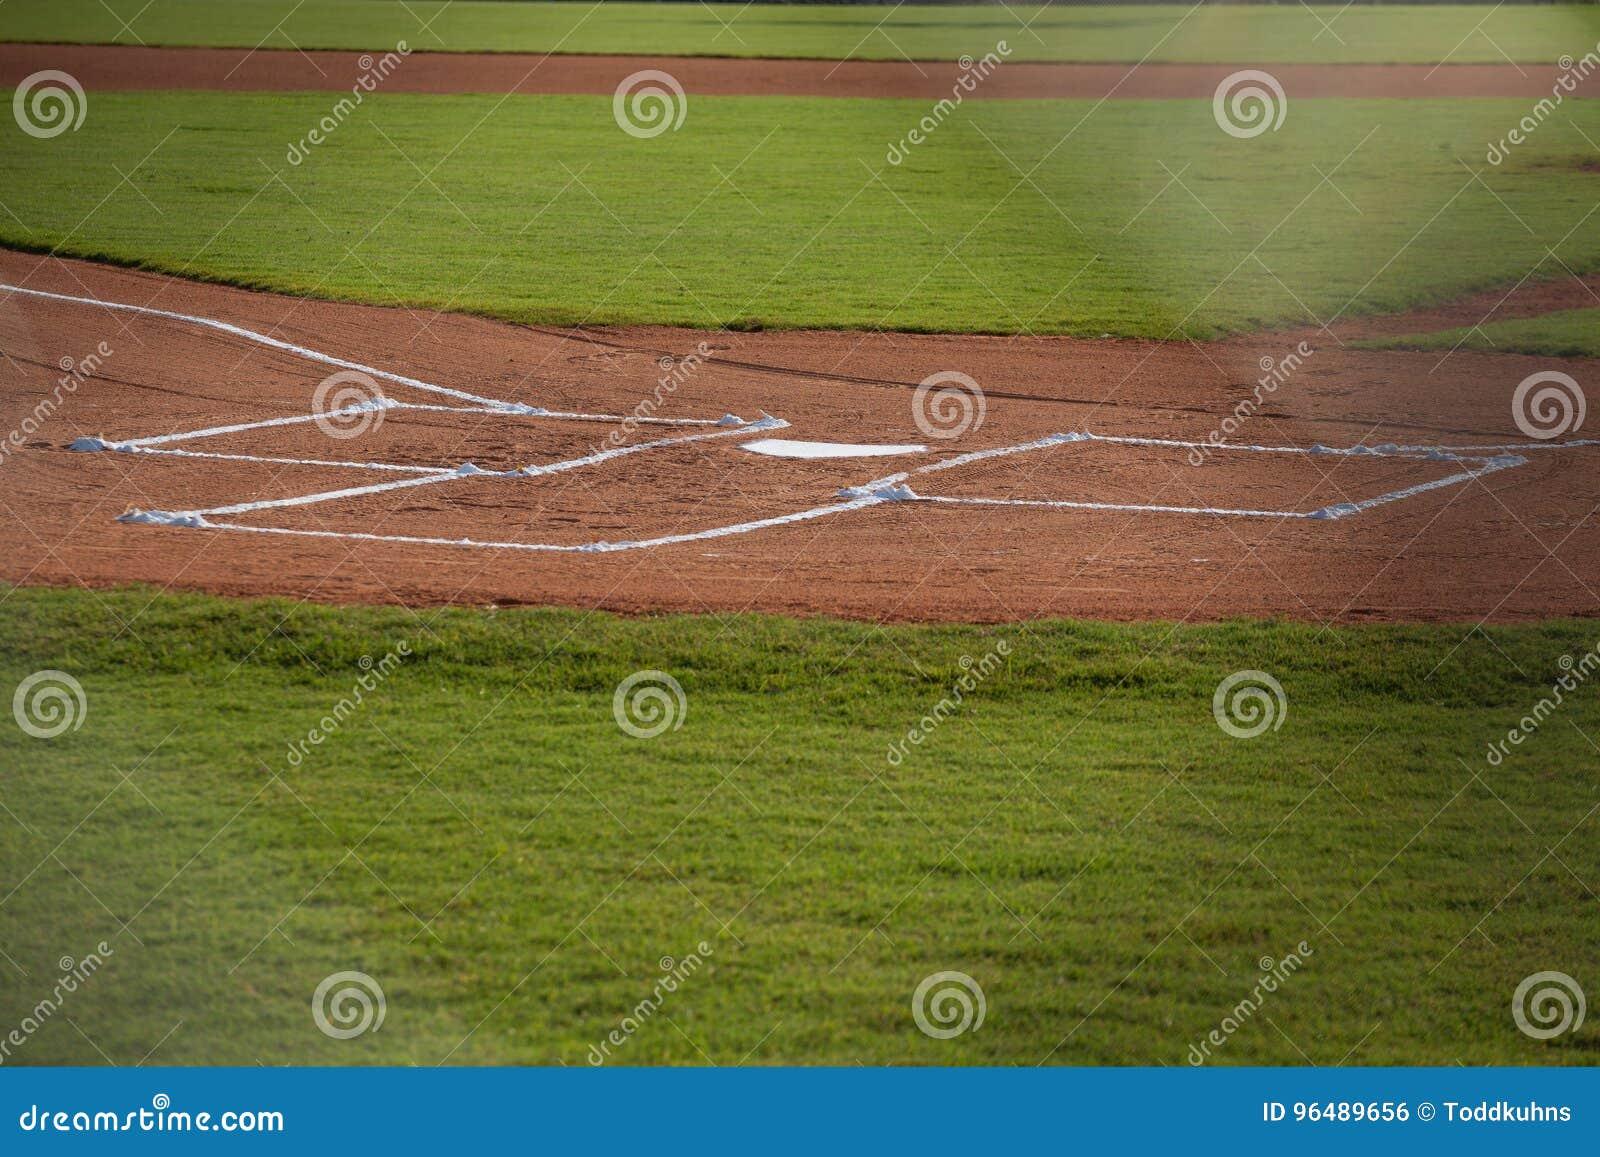 Домашняя плита на поле бейсбола